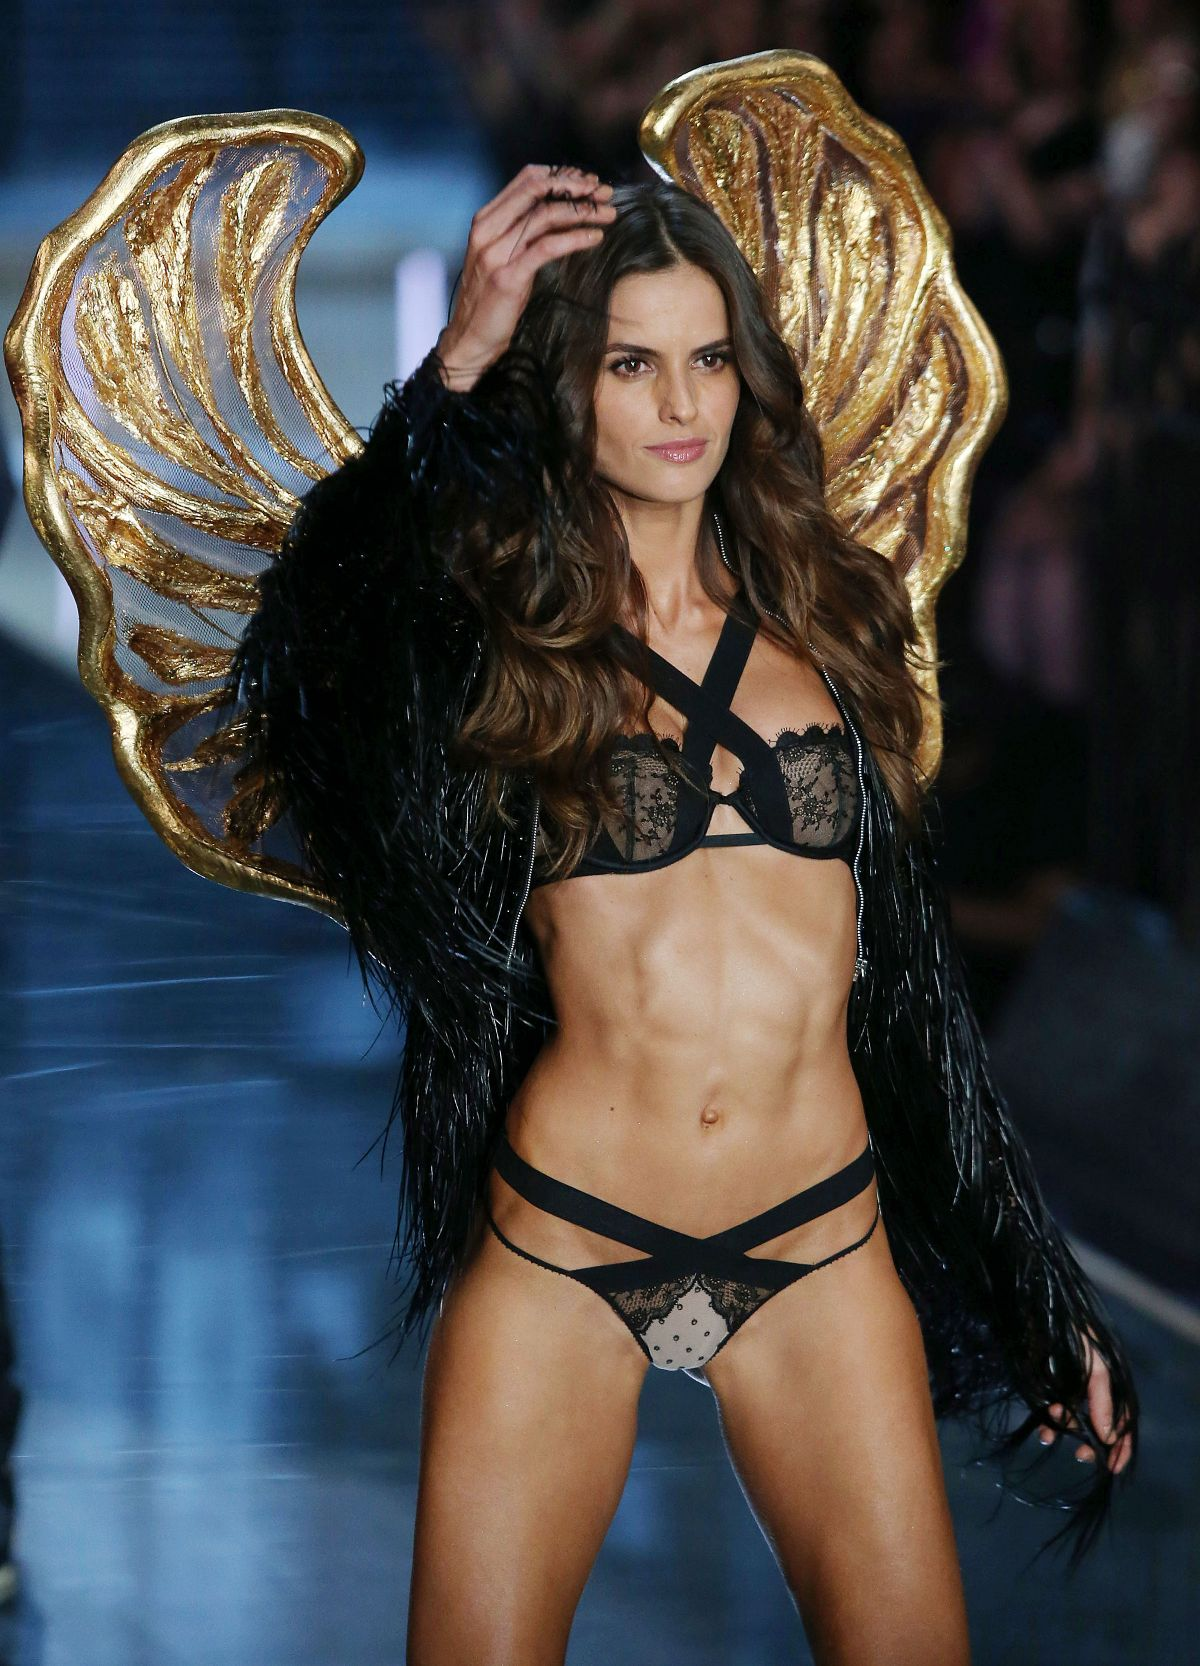 thiên thần Victoria's Secret elle việt nam izabel